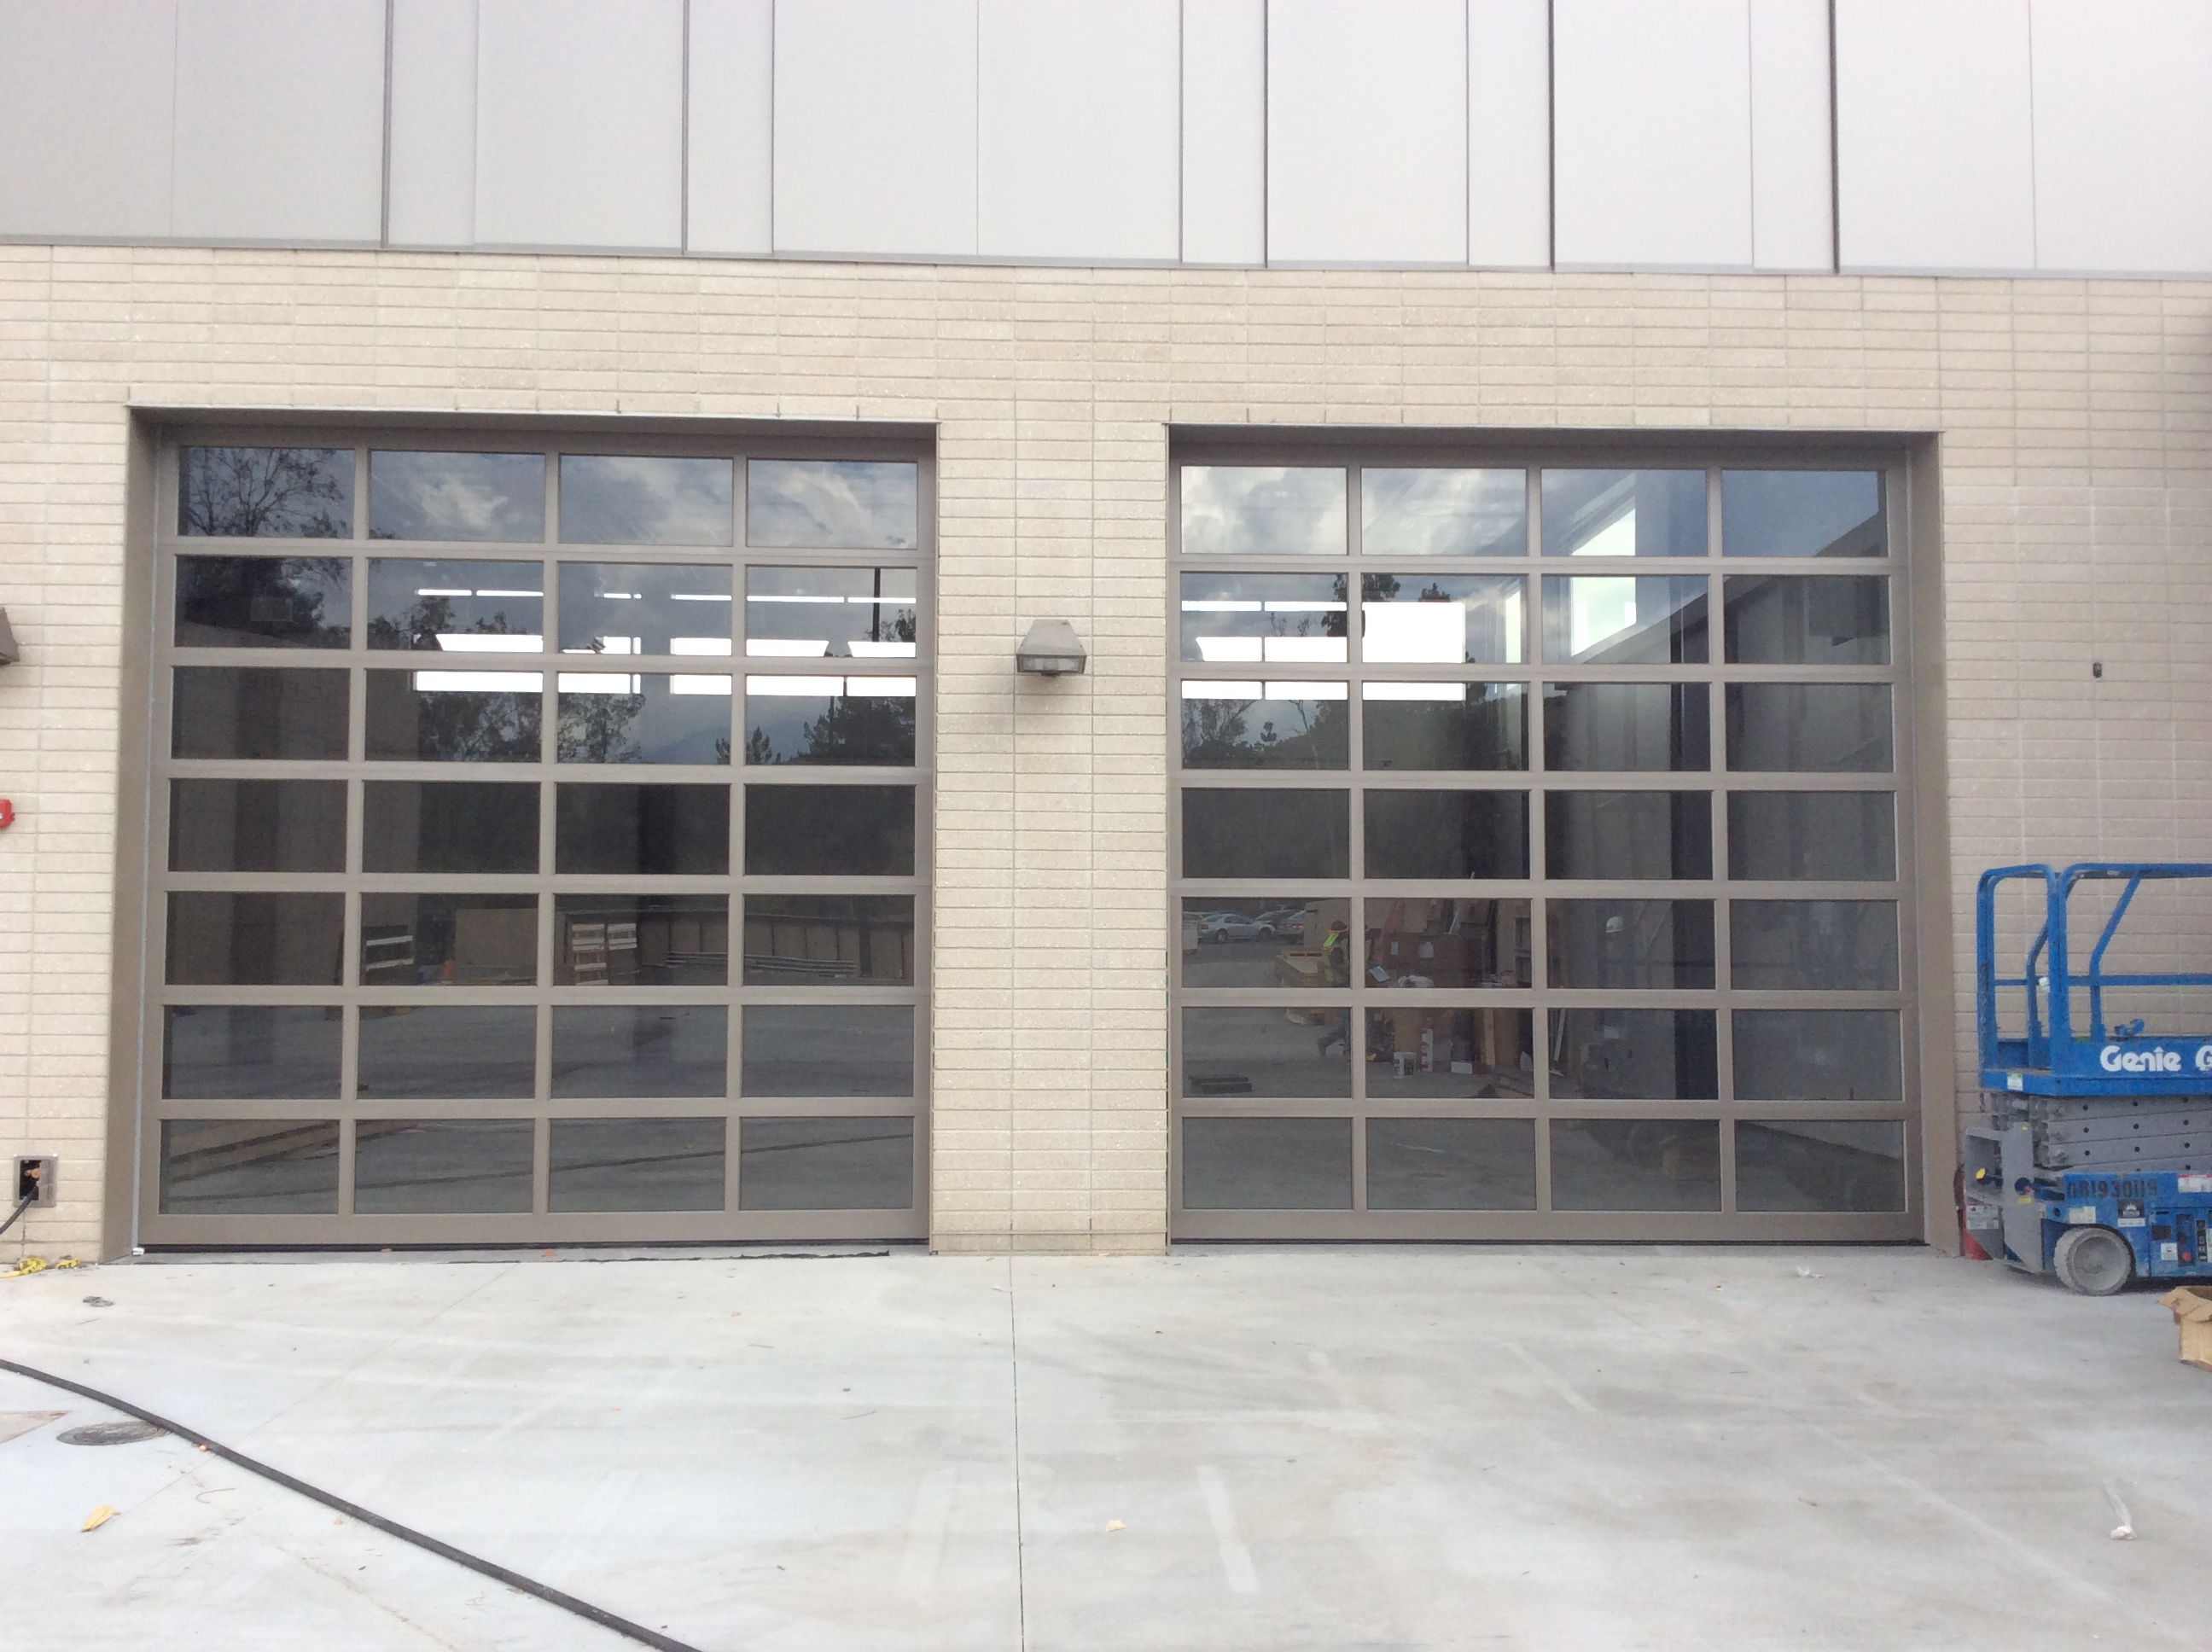 ... Crafton Hills Fire Training Center 2, Yucalpa, CA